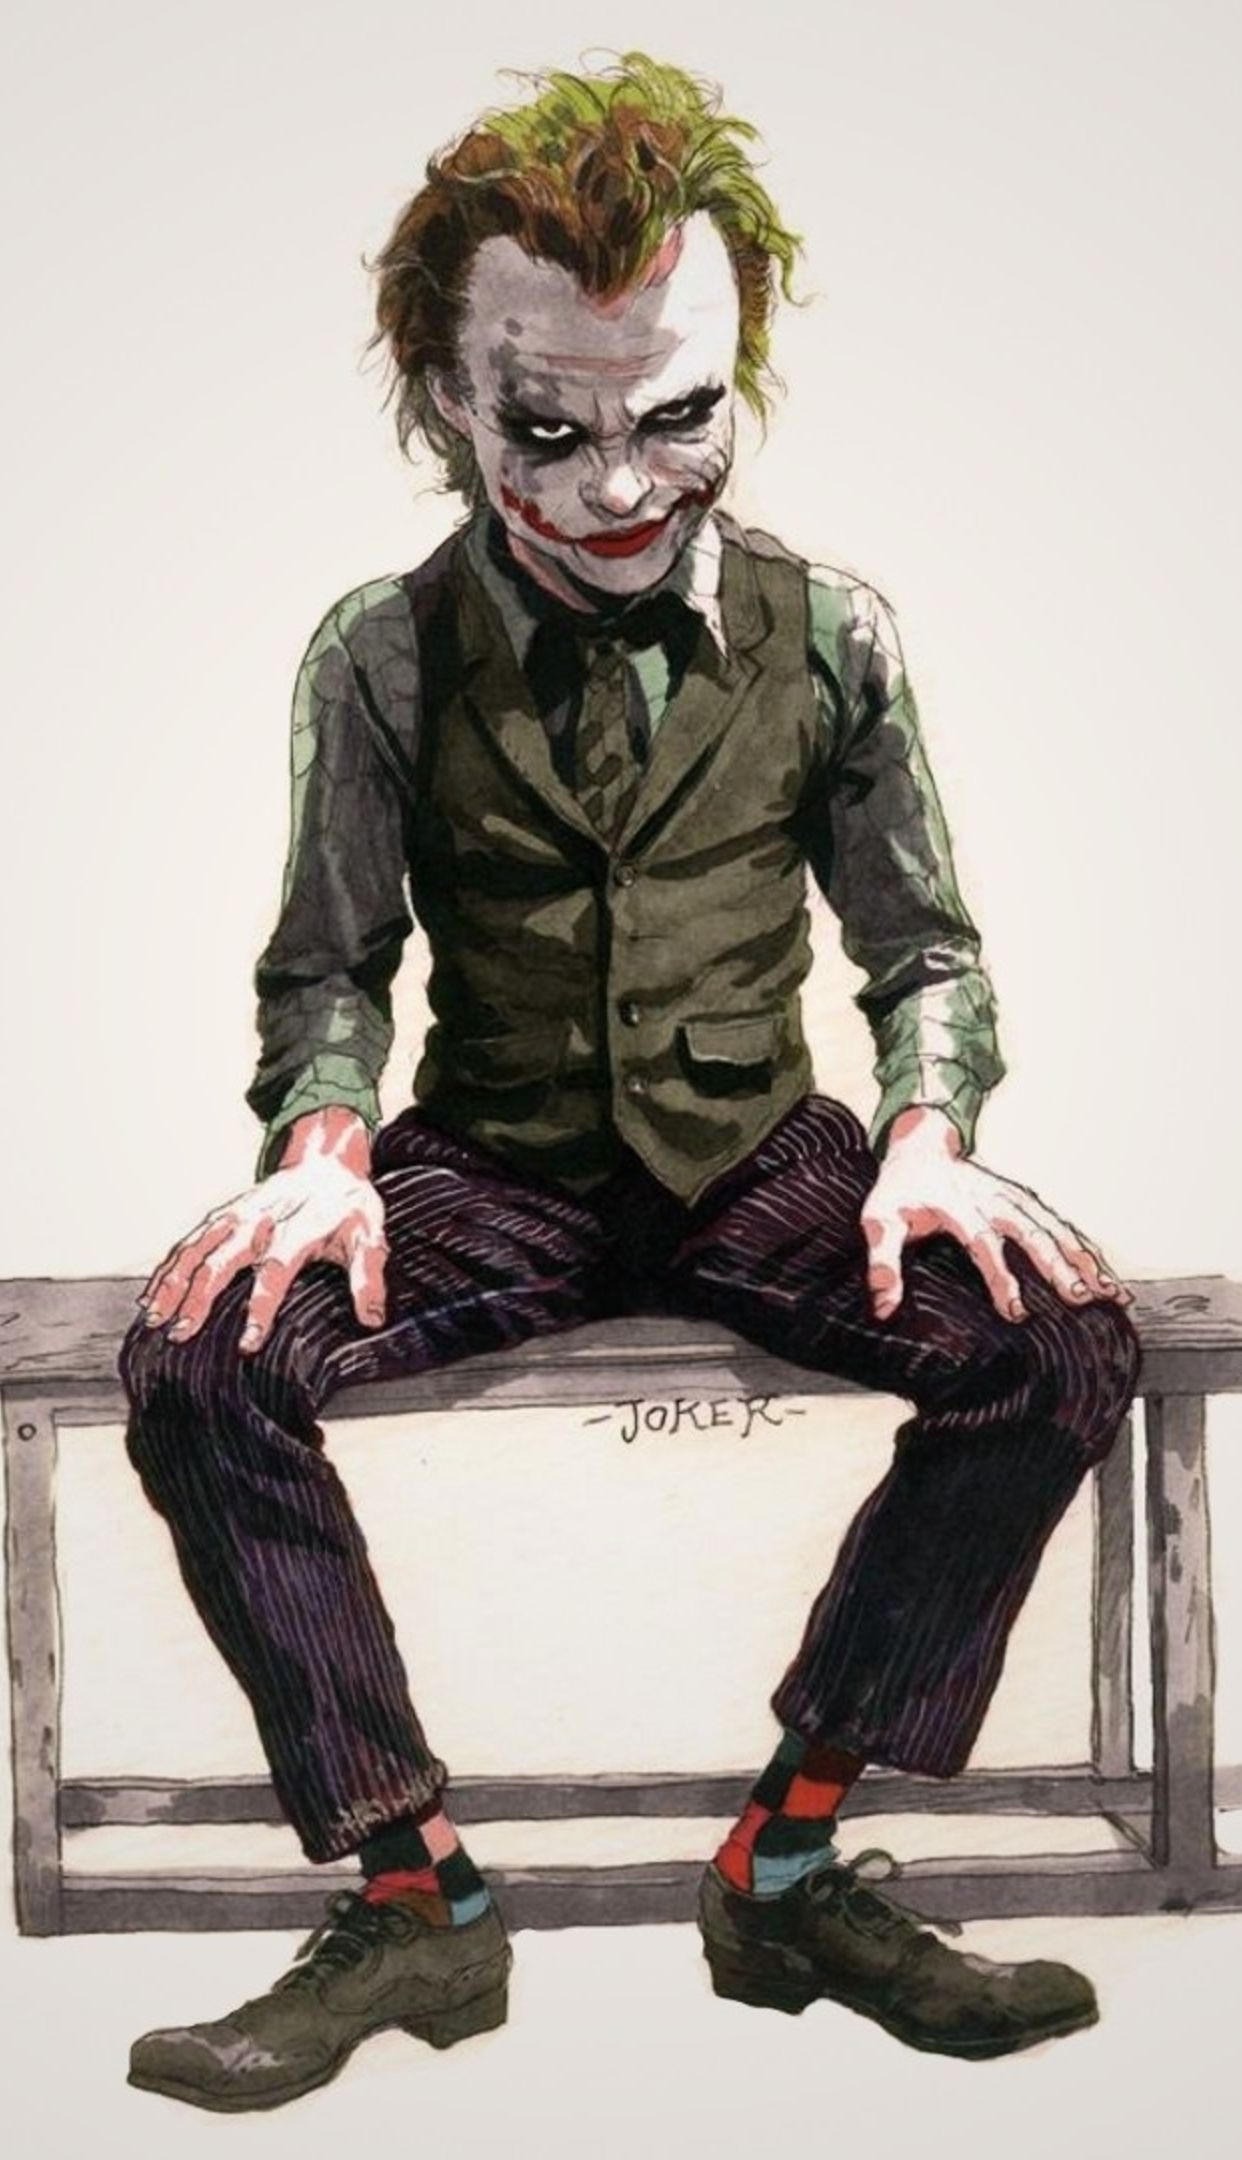 4k Wallpaper For Iphone 6s Plus - Dark Knight Wallpaper Joker Iphone , HD Wallpaper & Backgrounds